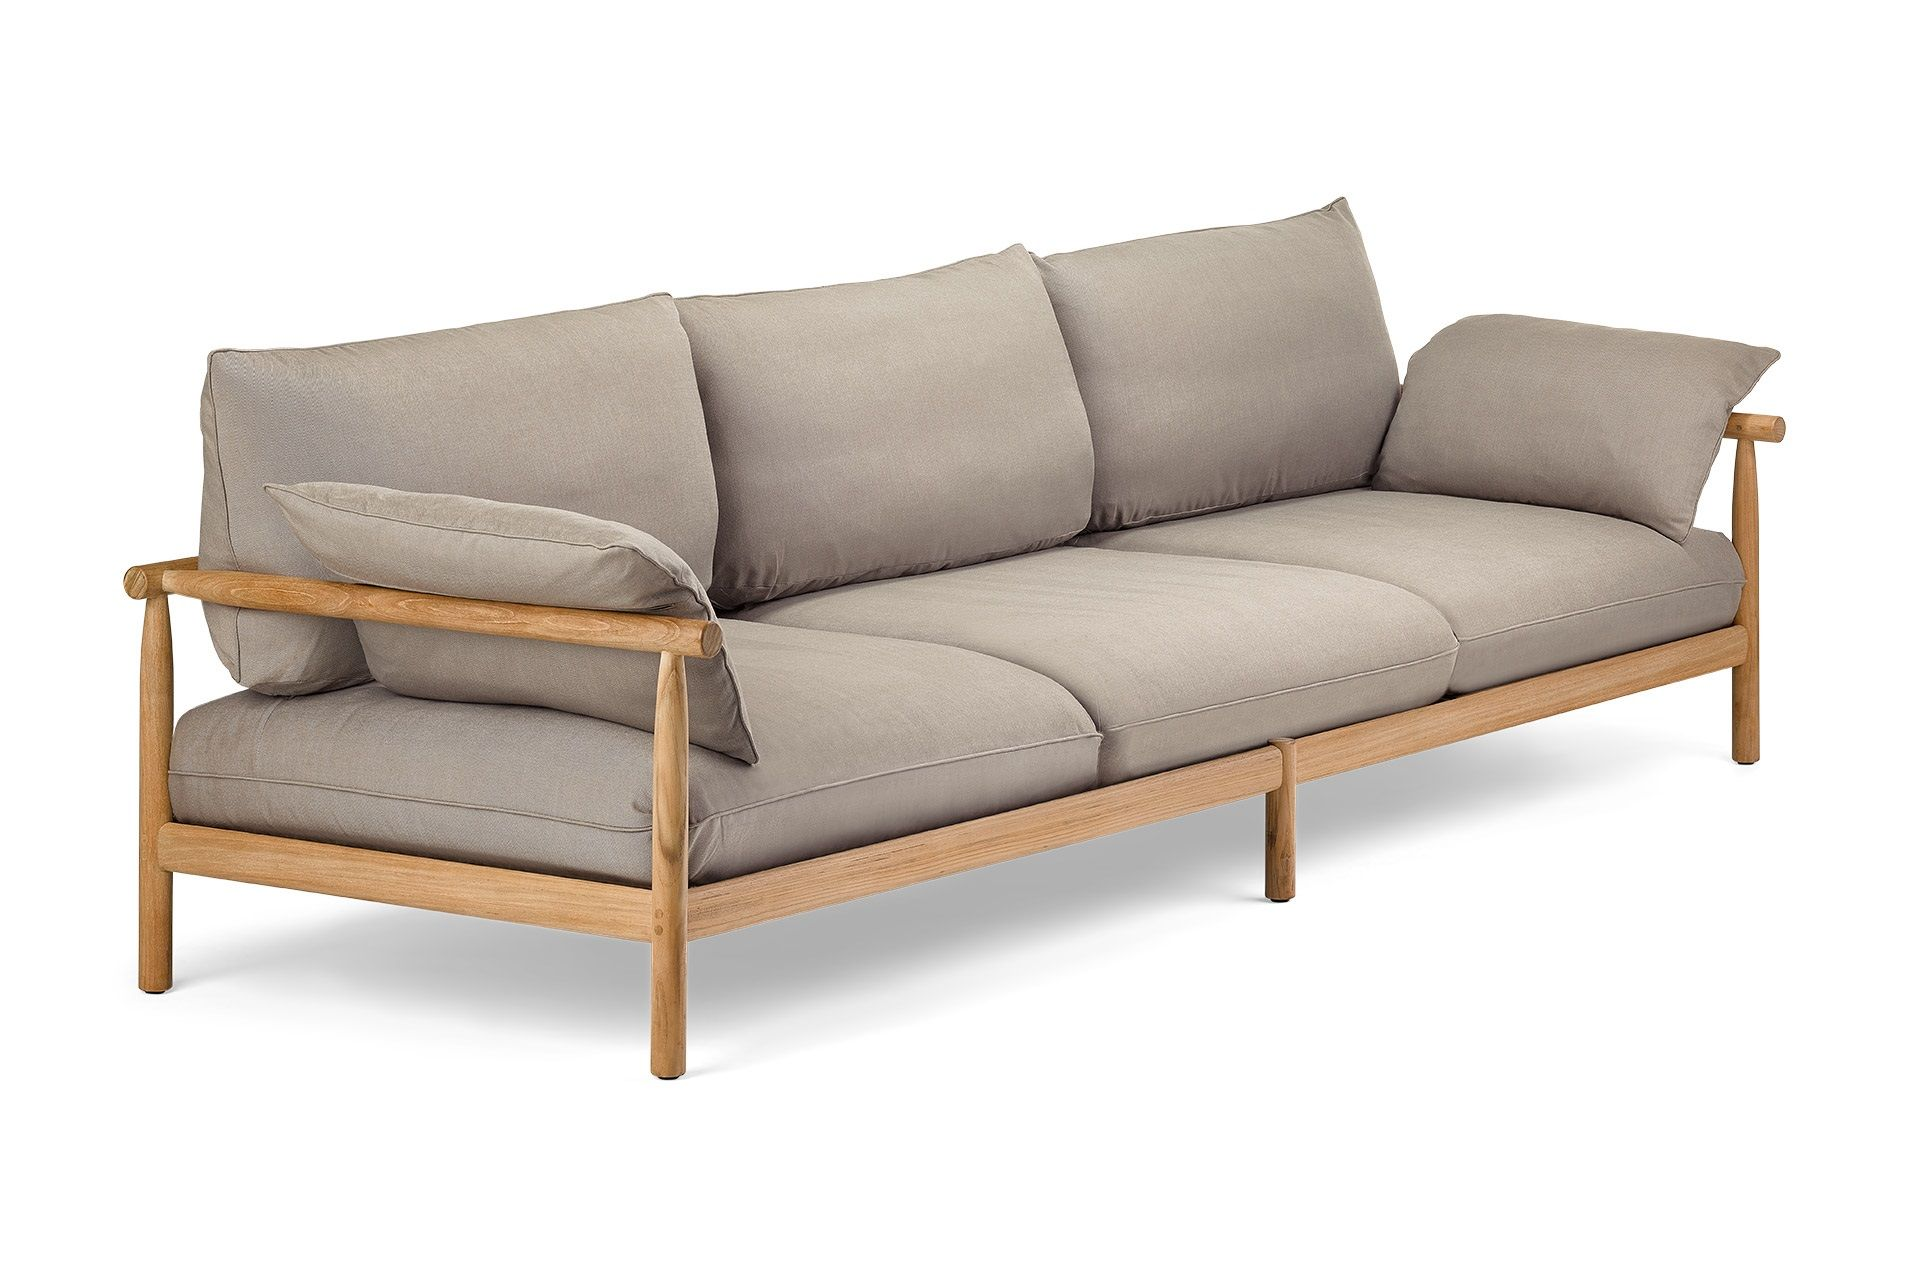 Dedon Tibbo 3 Seater Park Outdoor Furniture Pinterest Sofa